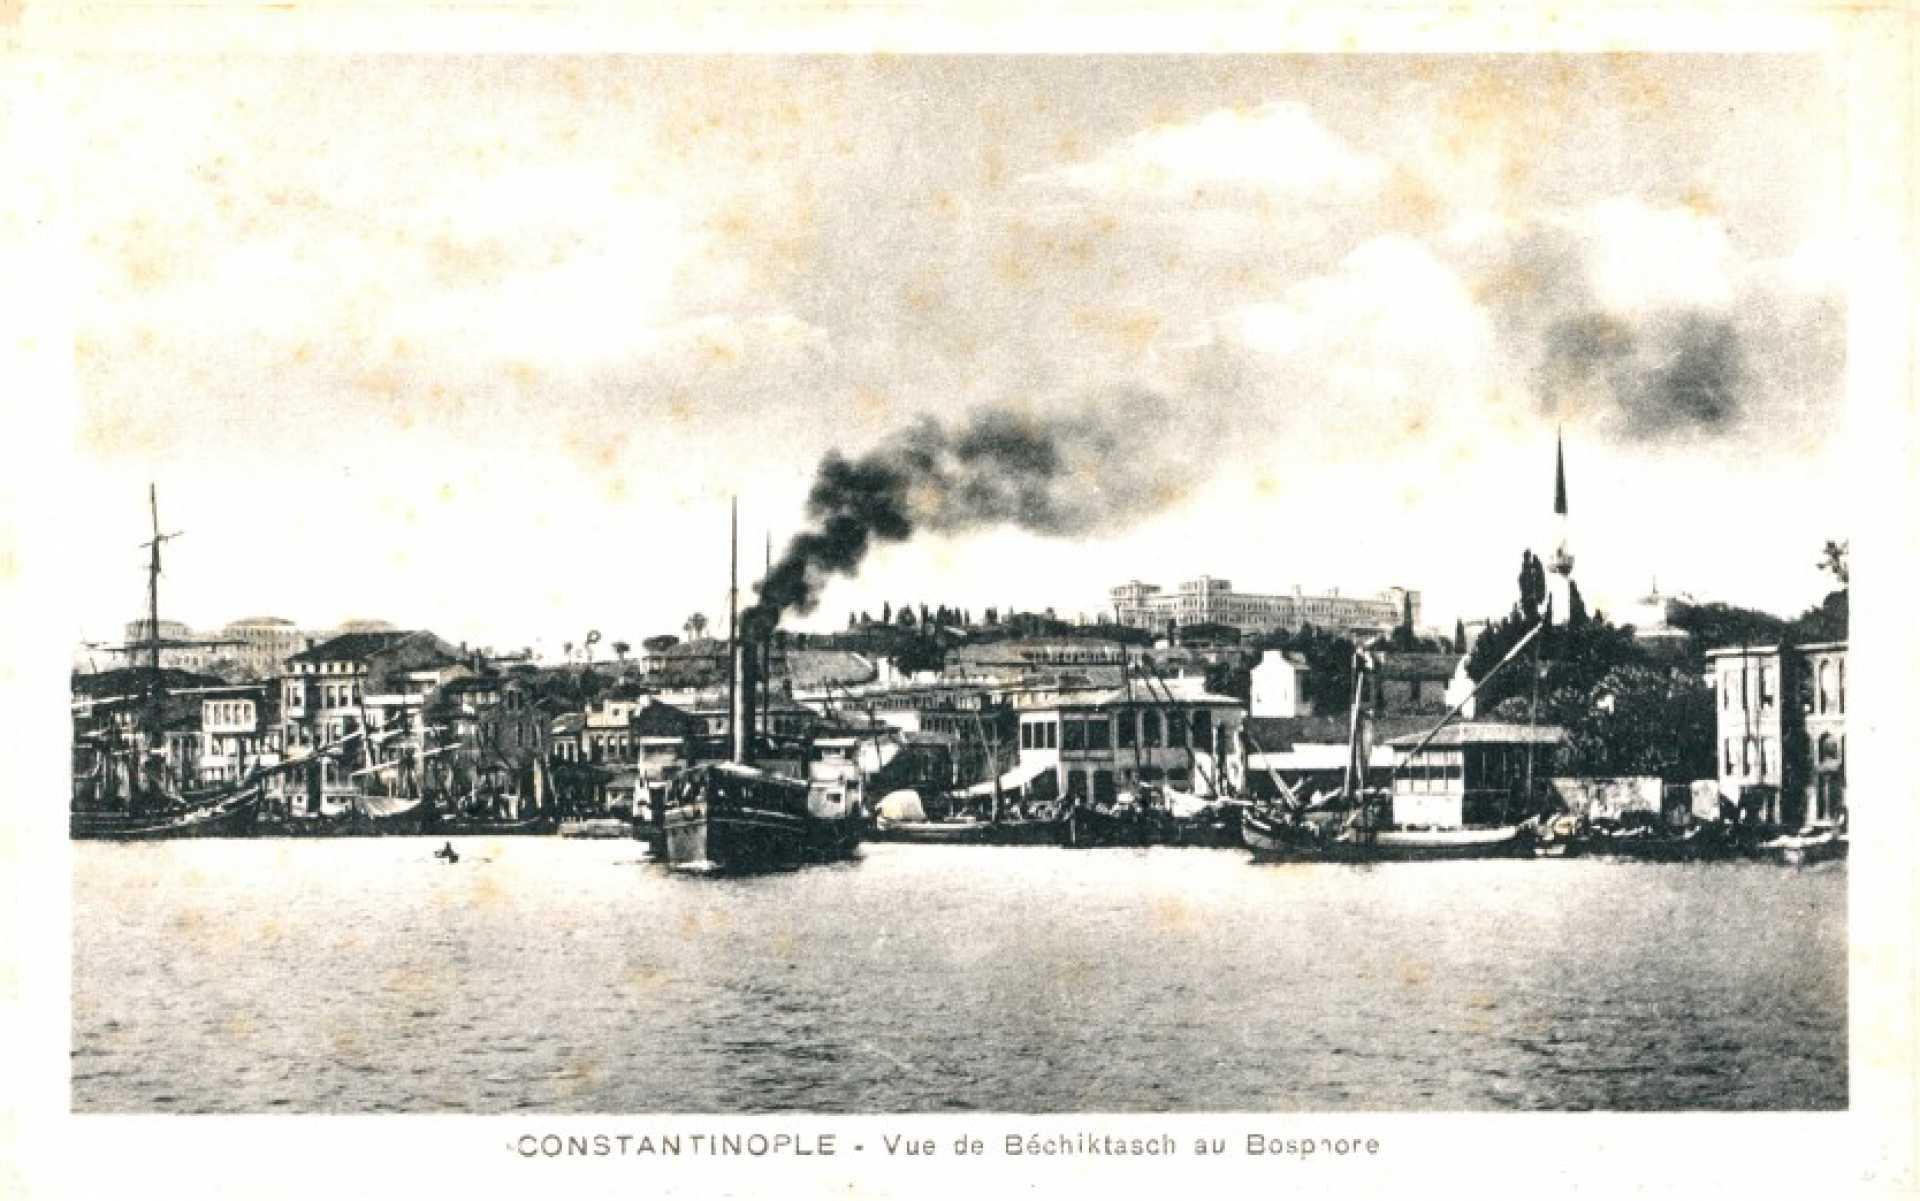 Vue de Bechiktasch au Bosphore